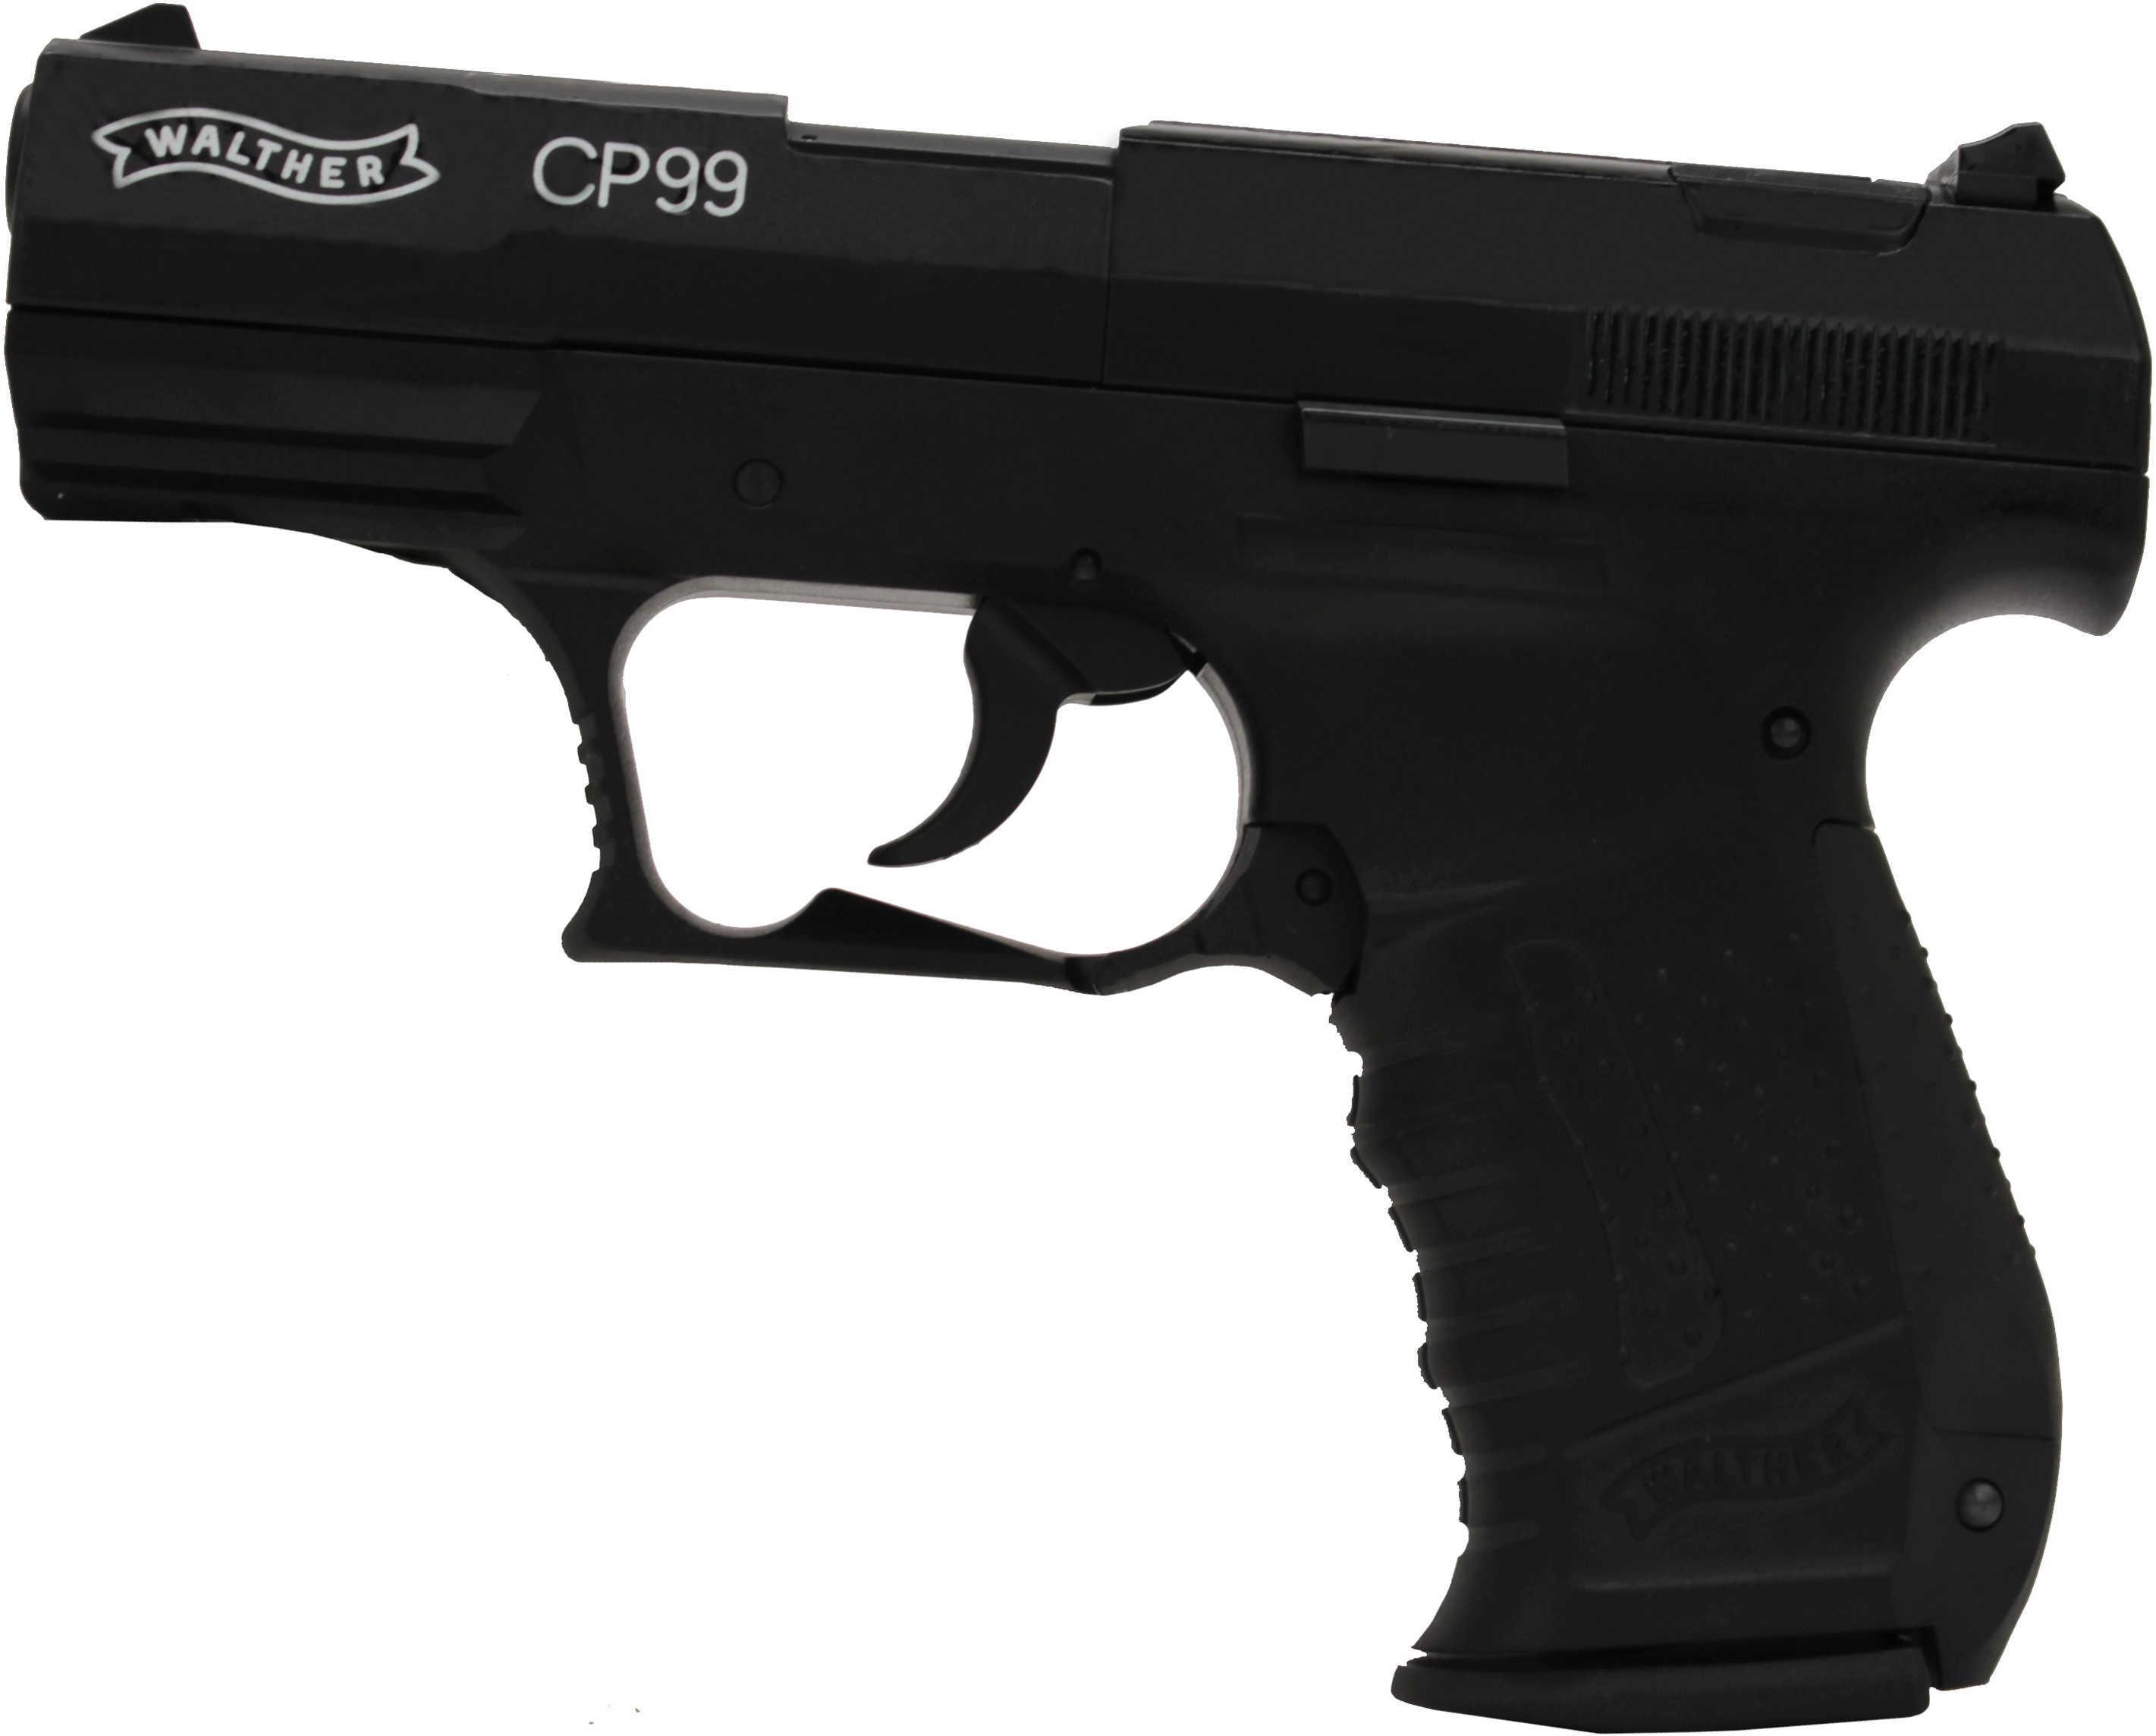 Umarex CP99 Black .177 Caliber Semi-Automatic Co2 Pistol With Spare 8 Shot Magazine Md: 2252201